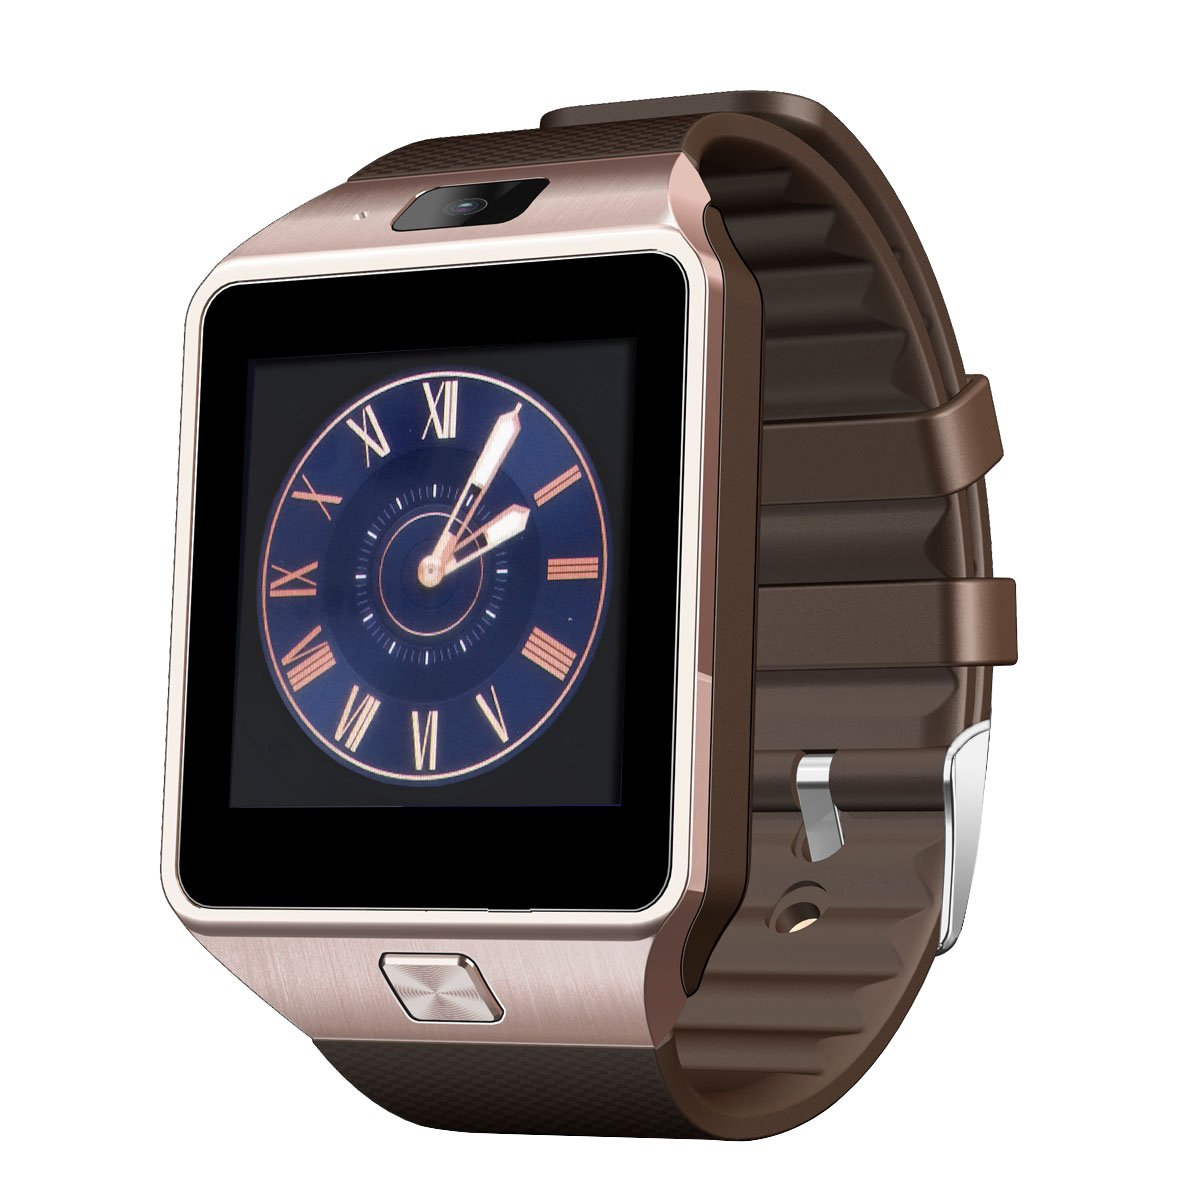 Otium Gear S Bluetooth Smart Watch WristWatch Sim insert anti-lost Call reminder Phone Mate (Bronze)